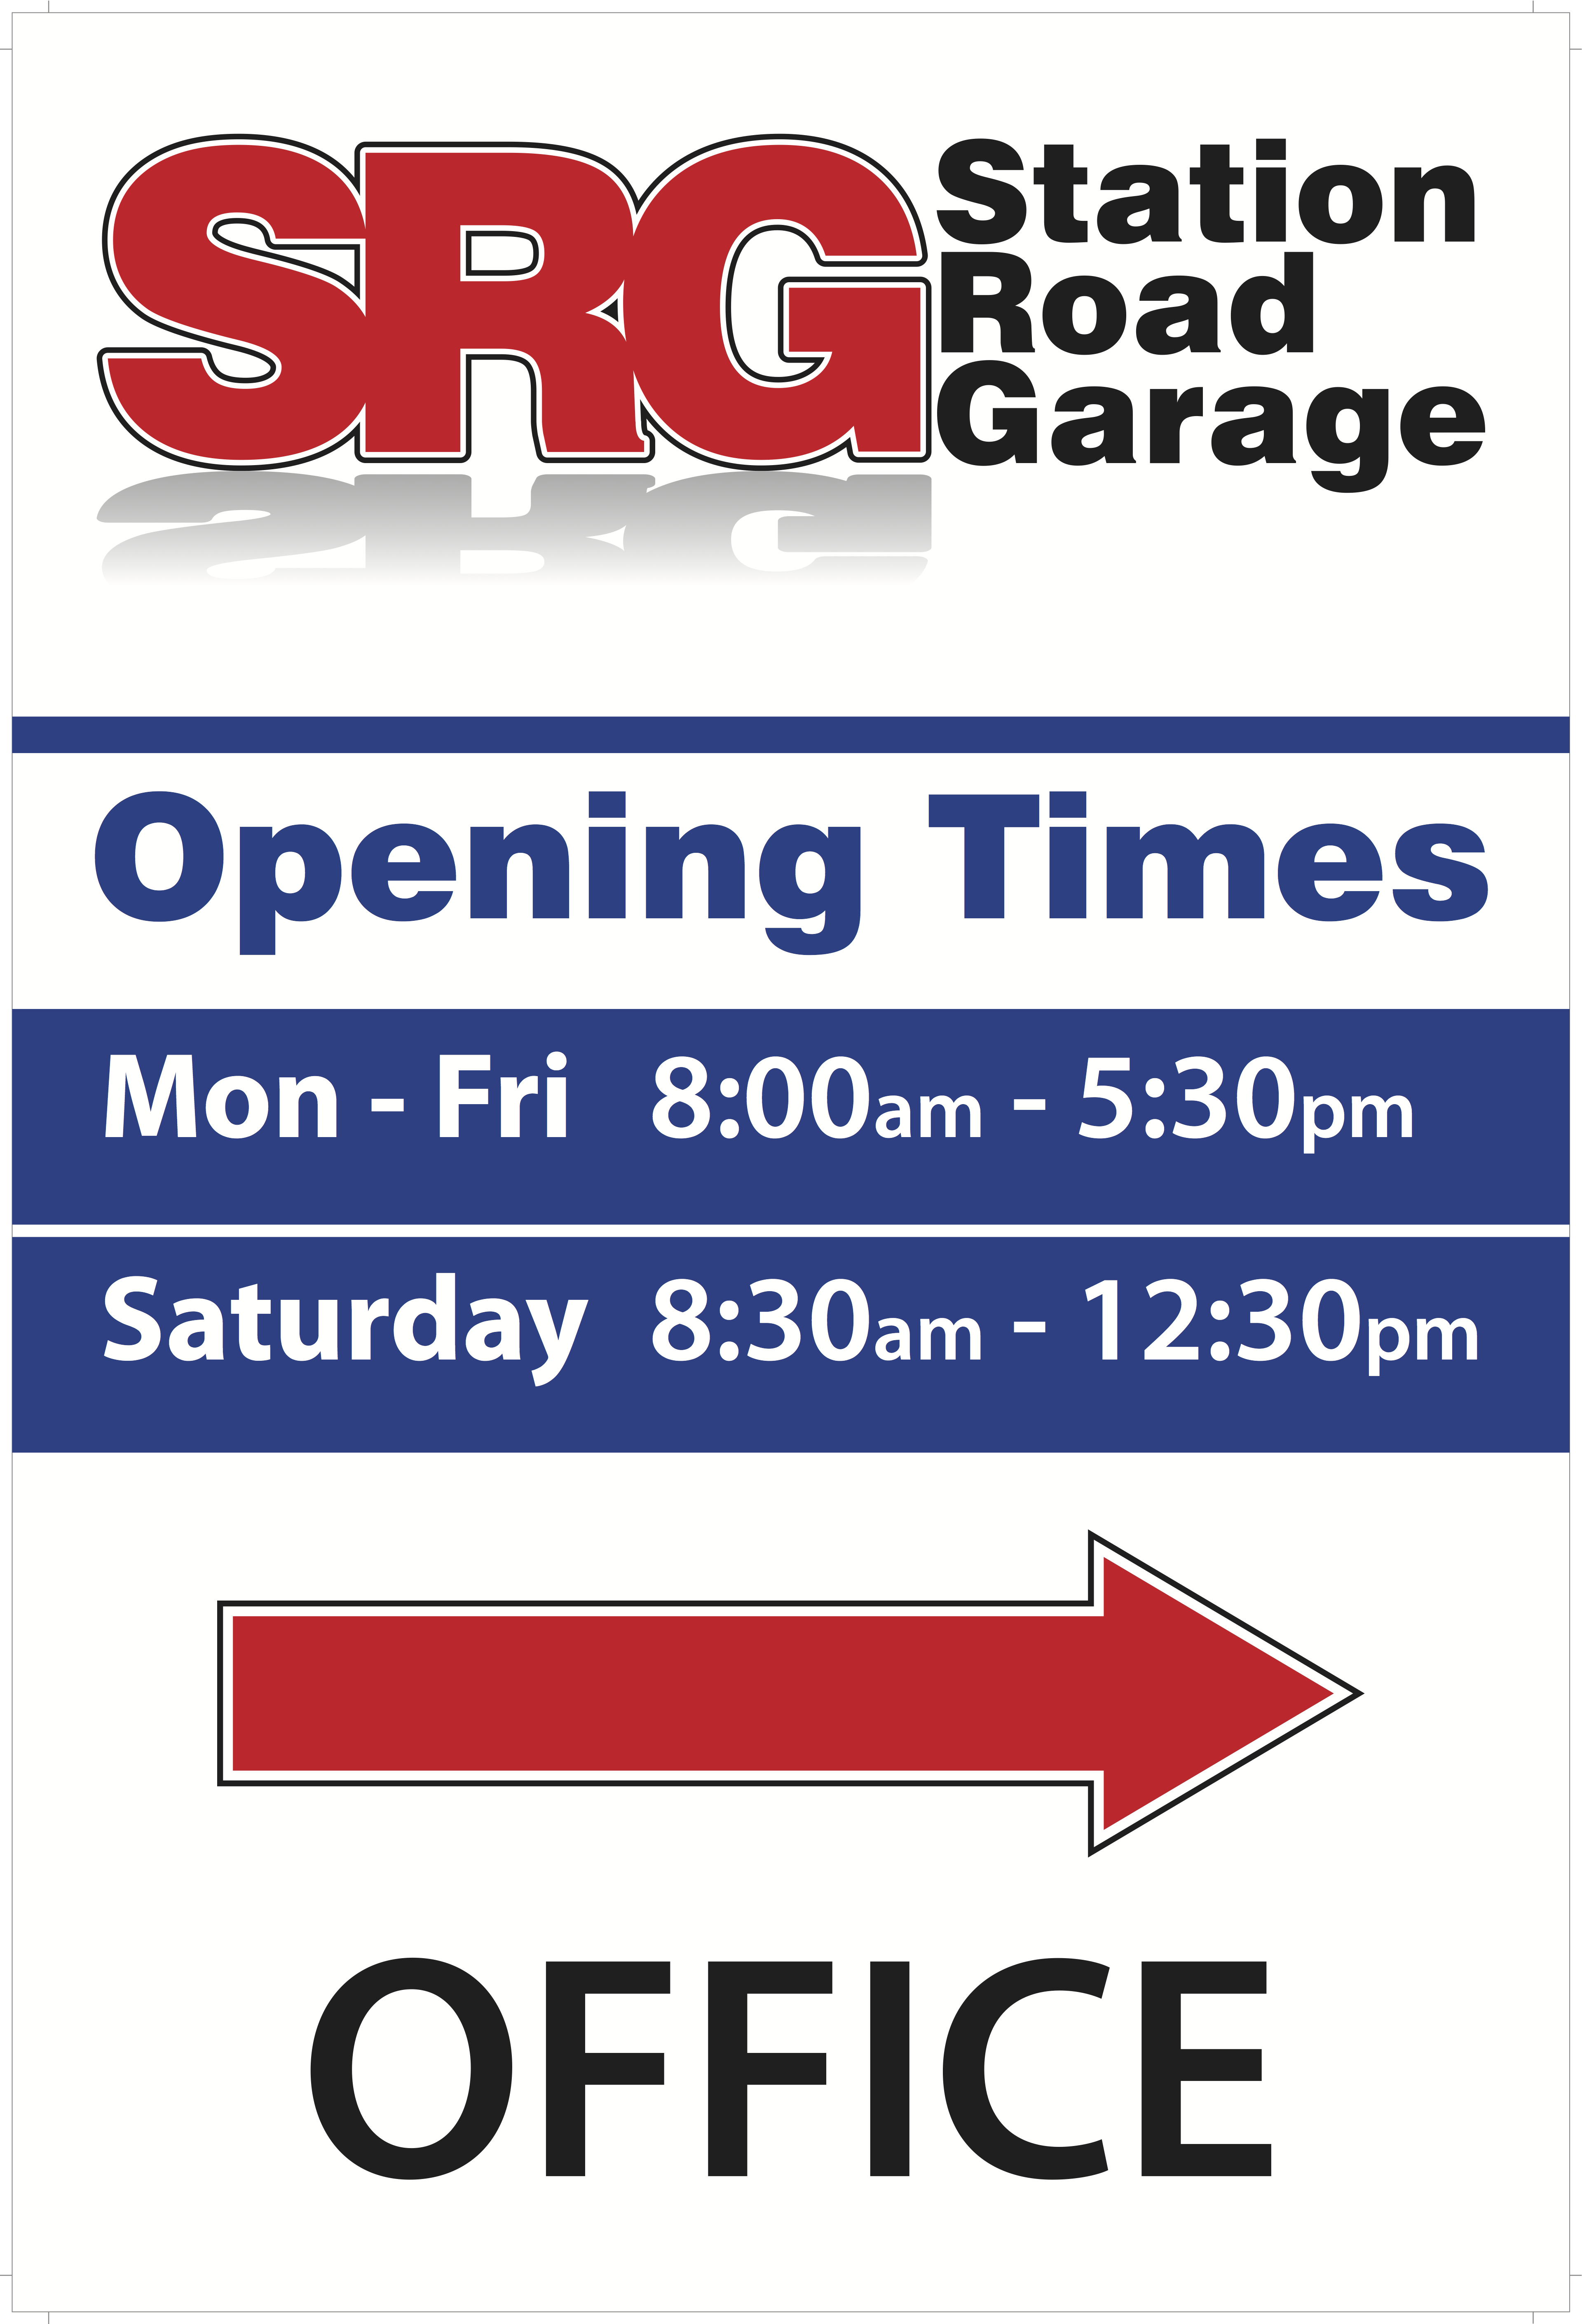 Read Station Road Garage Reviews